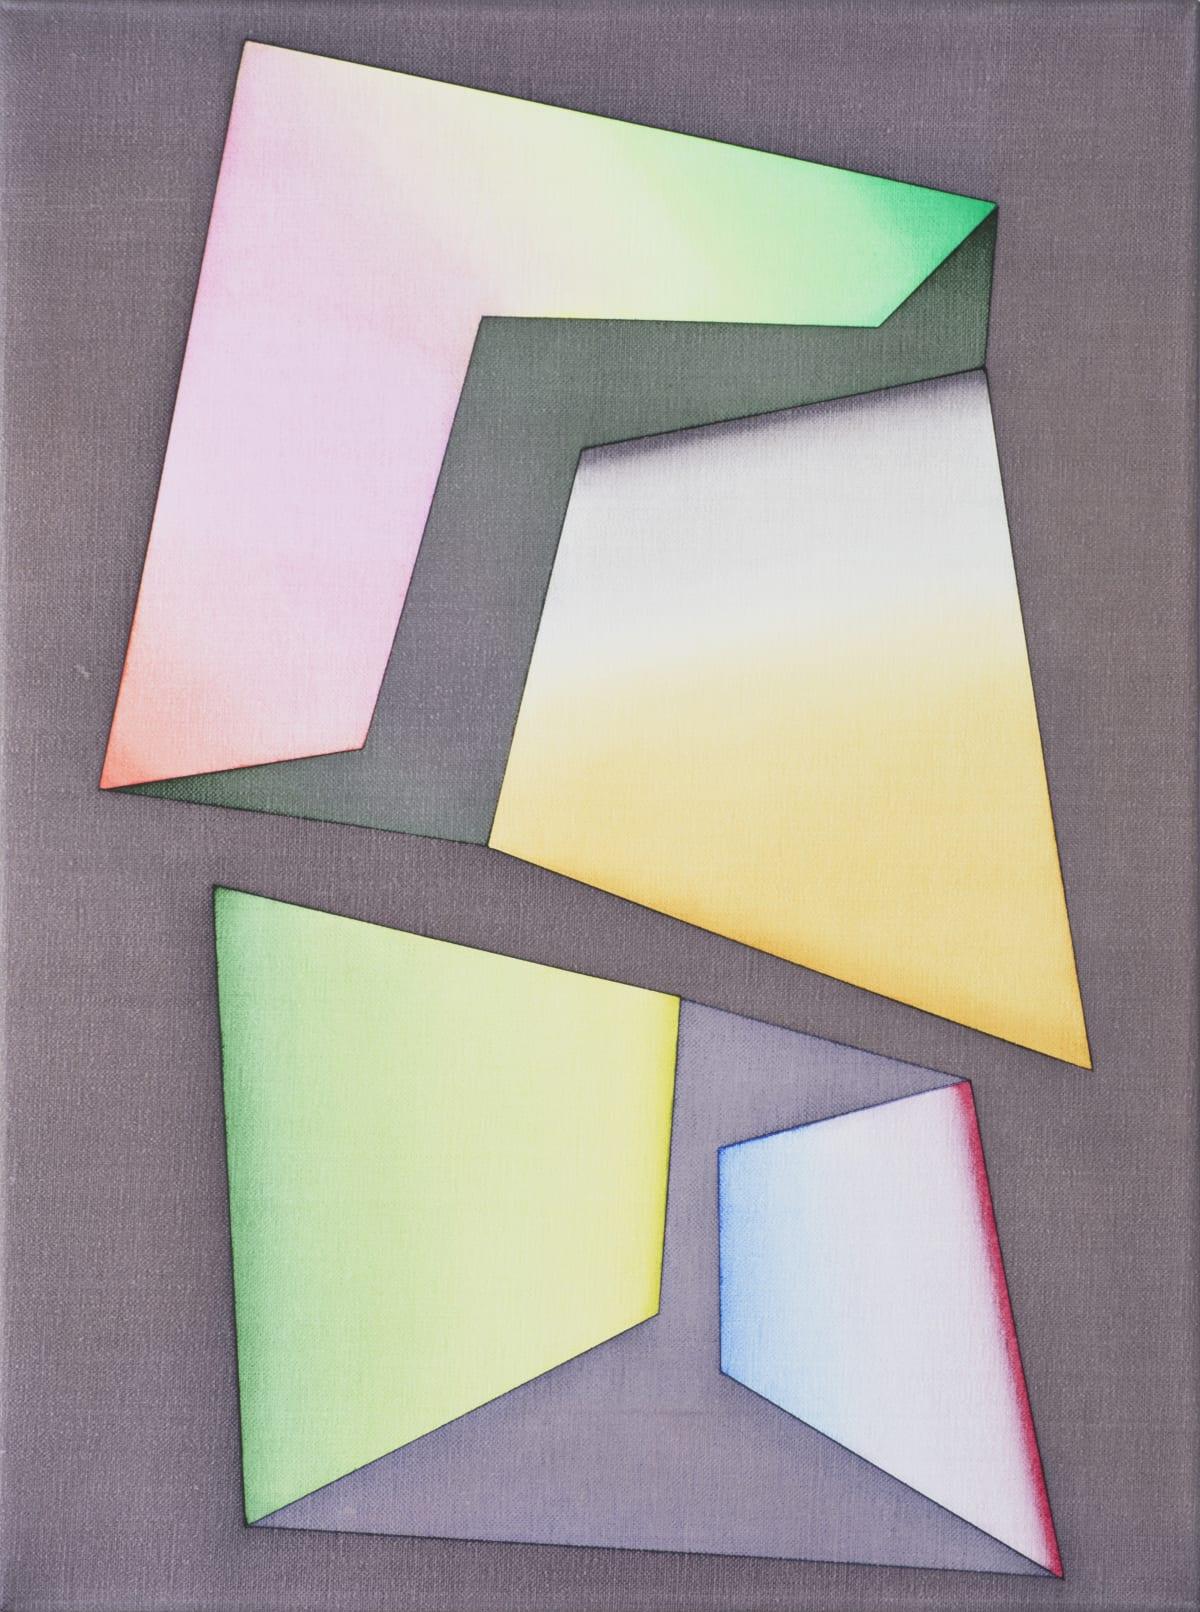 Selma Parlour, Smack Dab III, 2019, oil on linen, 41 x 30.5 cm